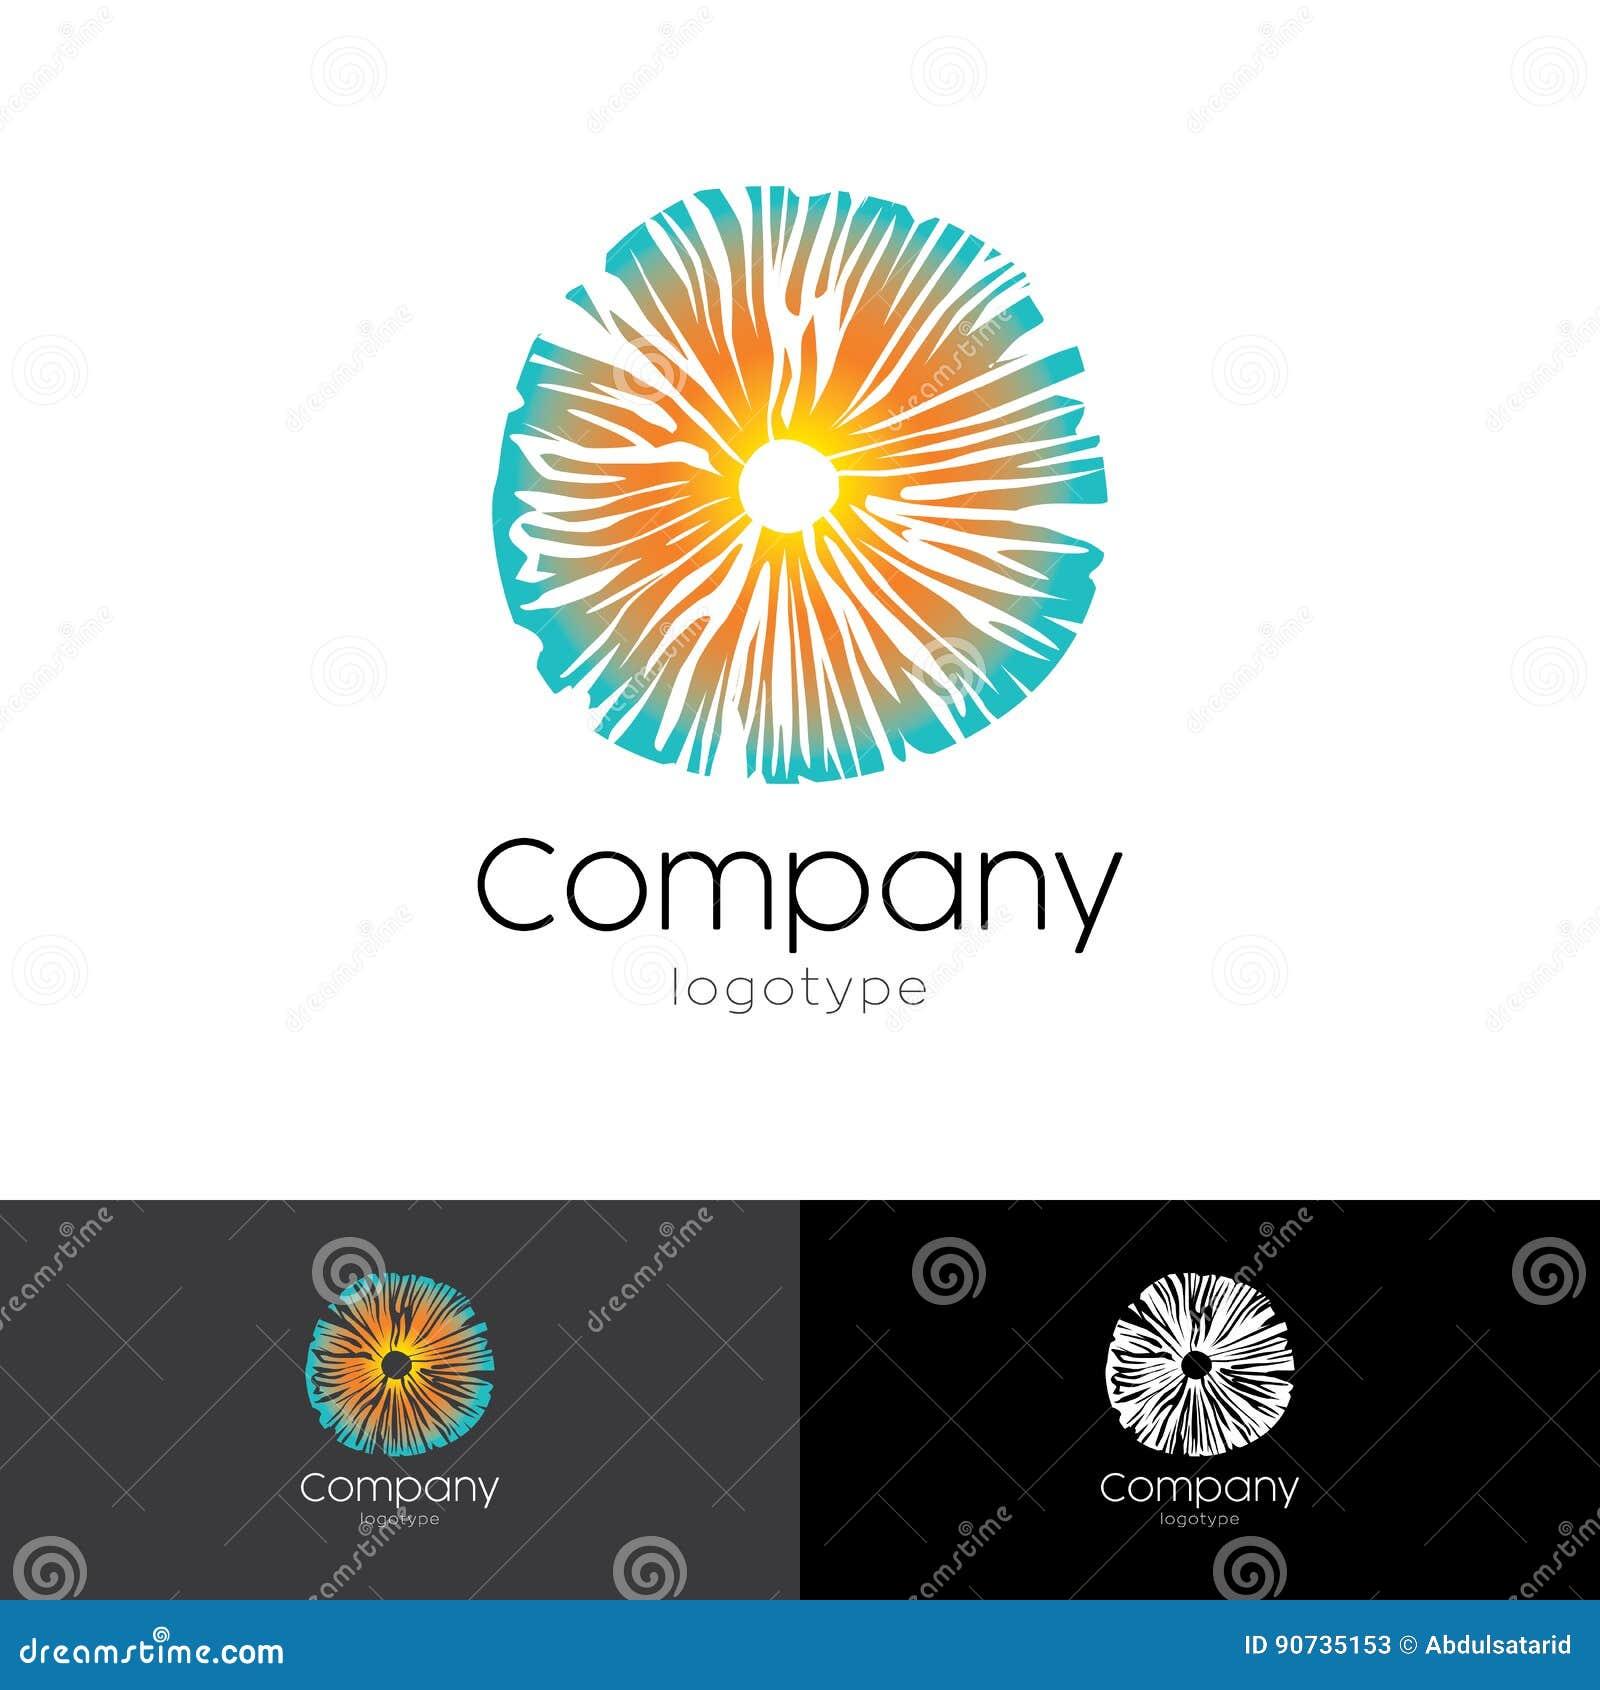 Psychedelic Logo Based On Mushroom Stock Vector - Illustration of ...